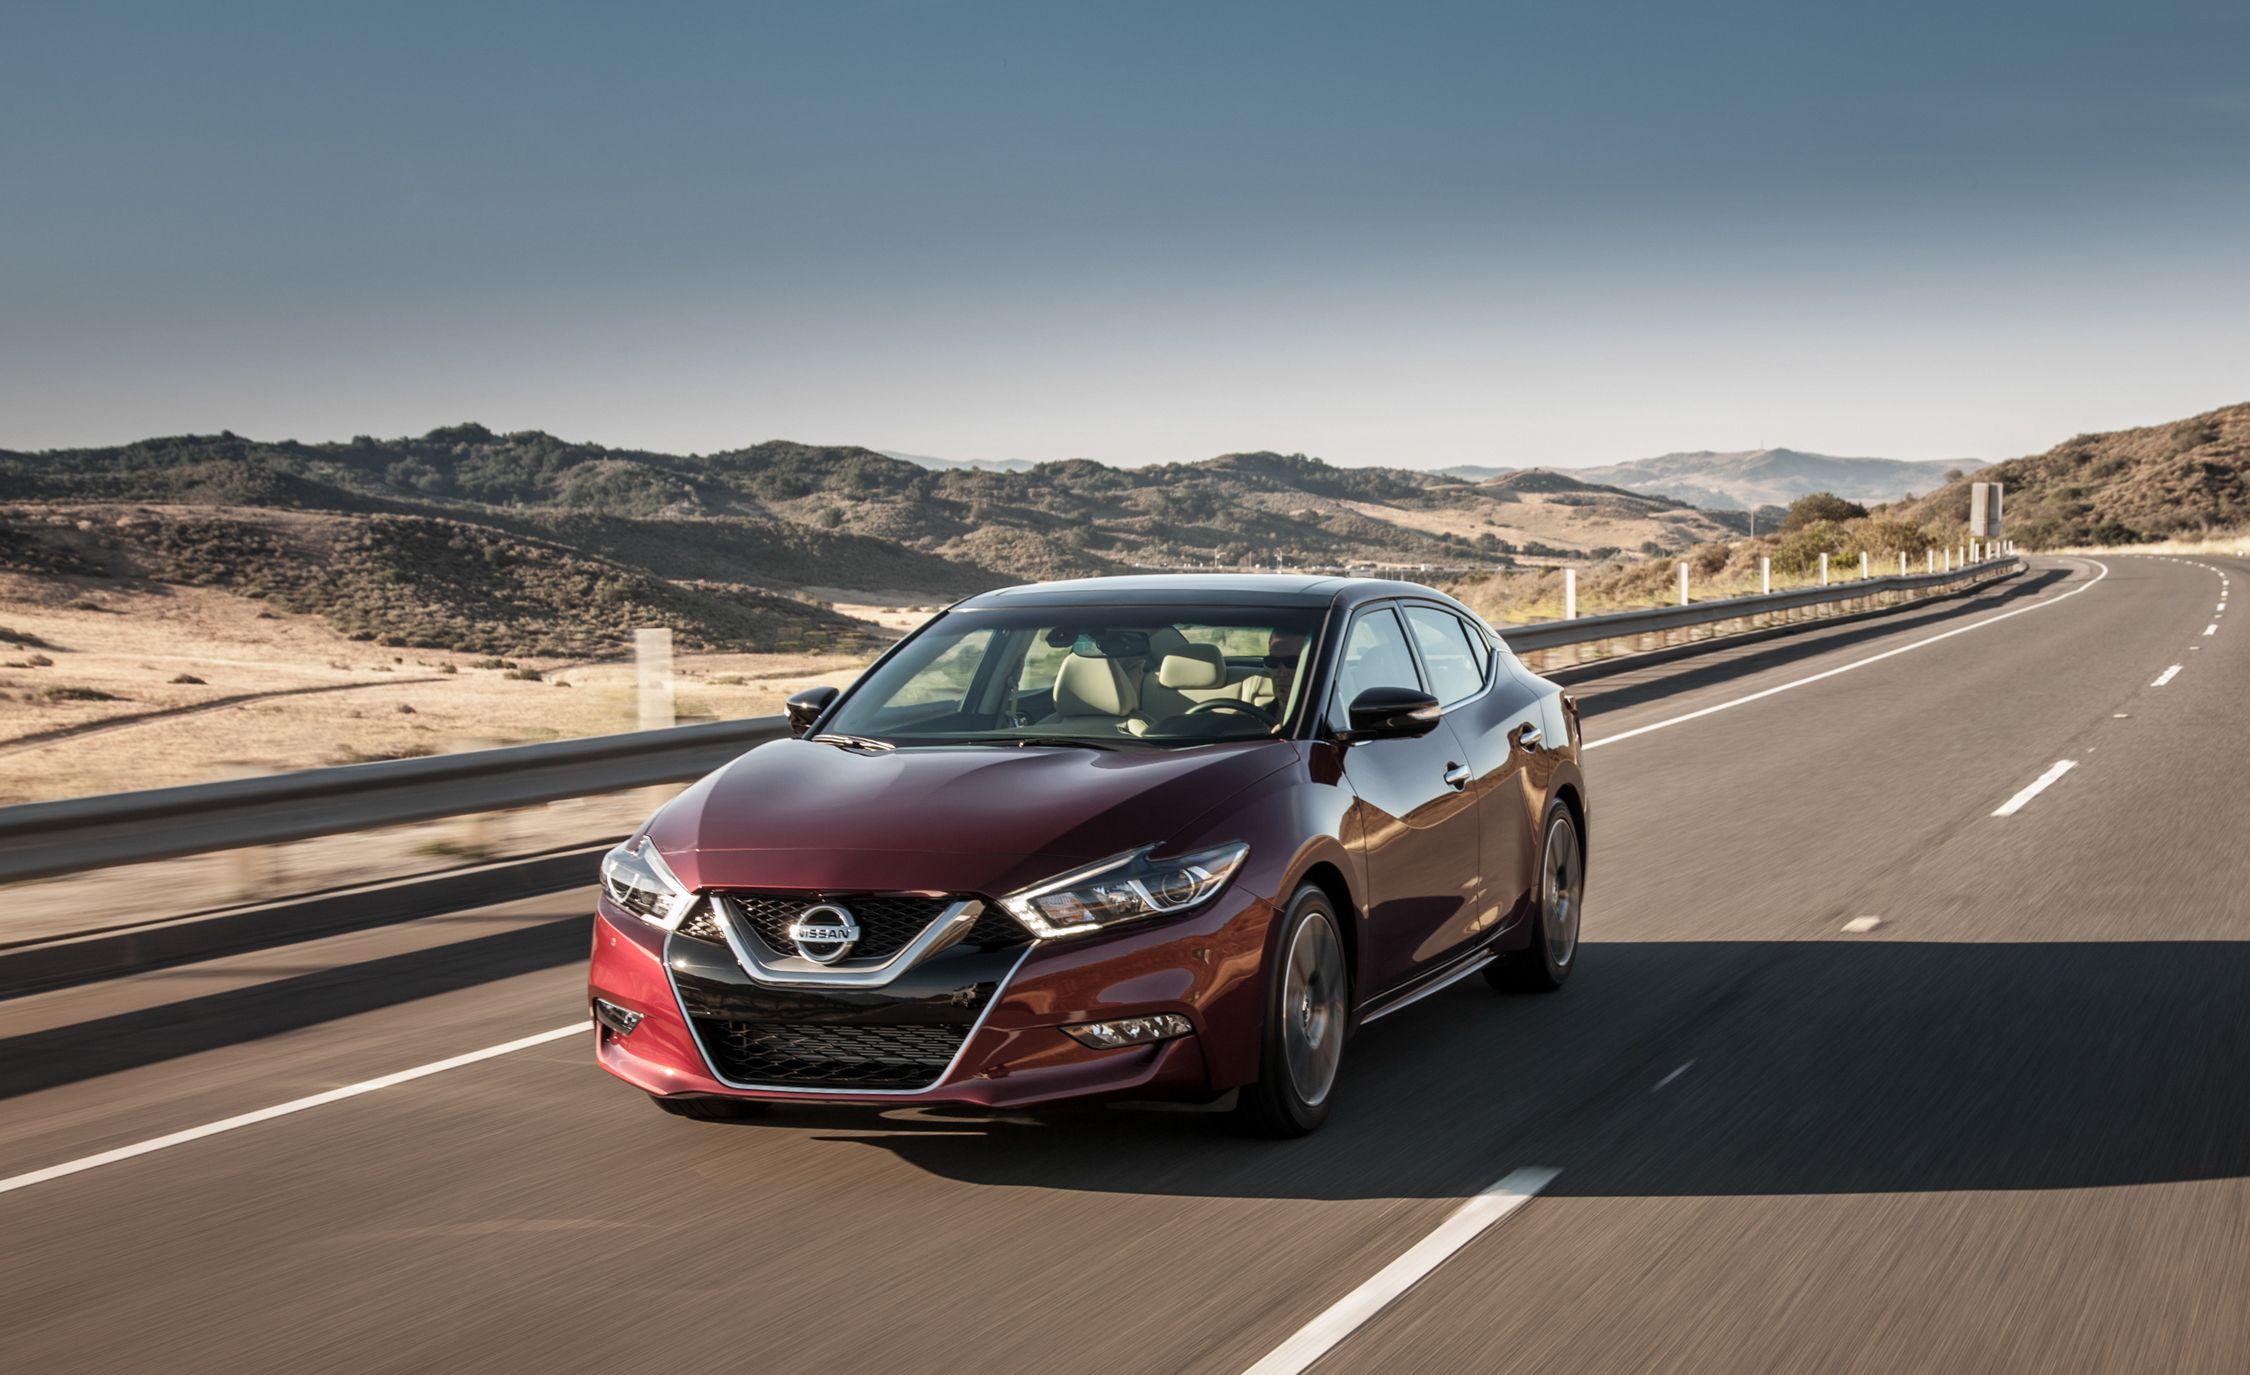 Nissan Maxima: Avoiding collision and rollover